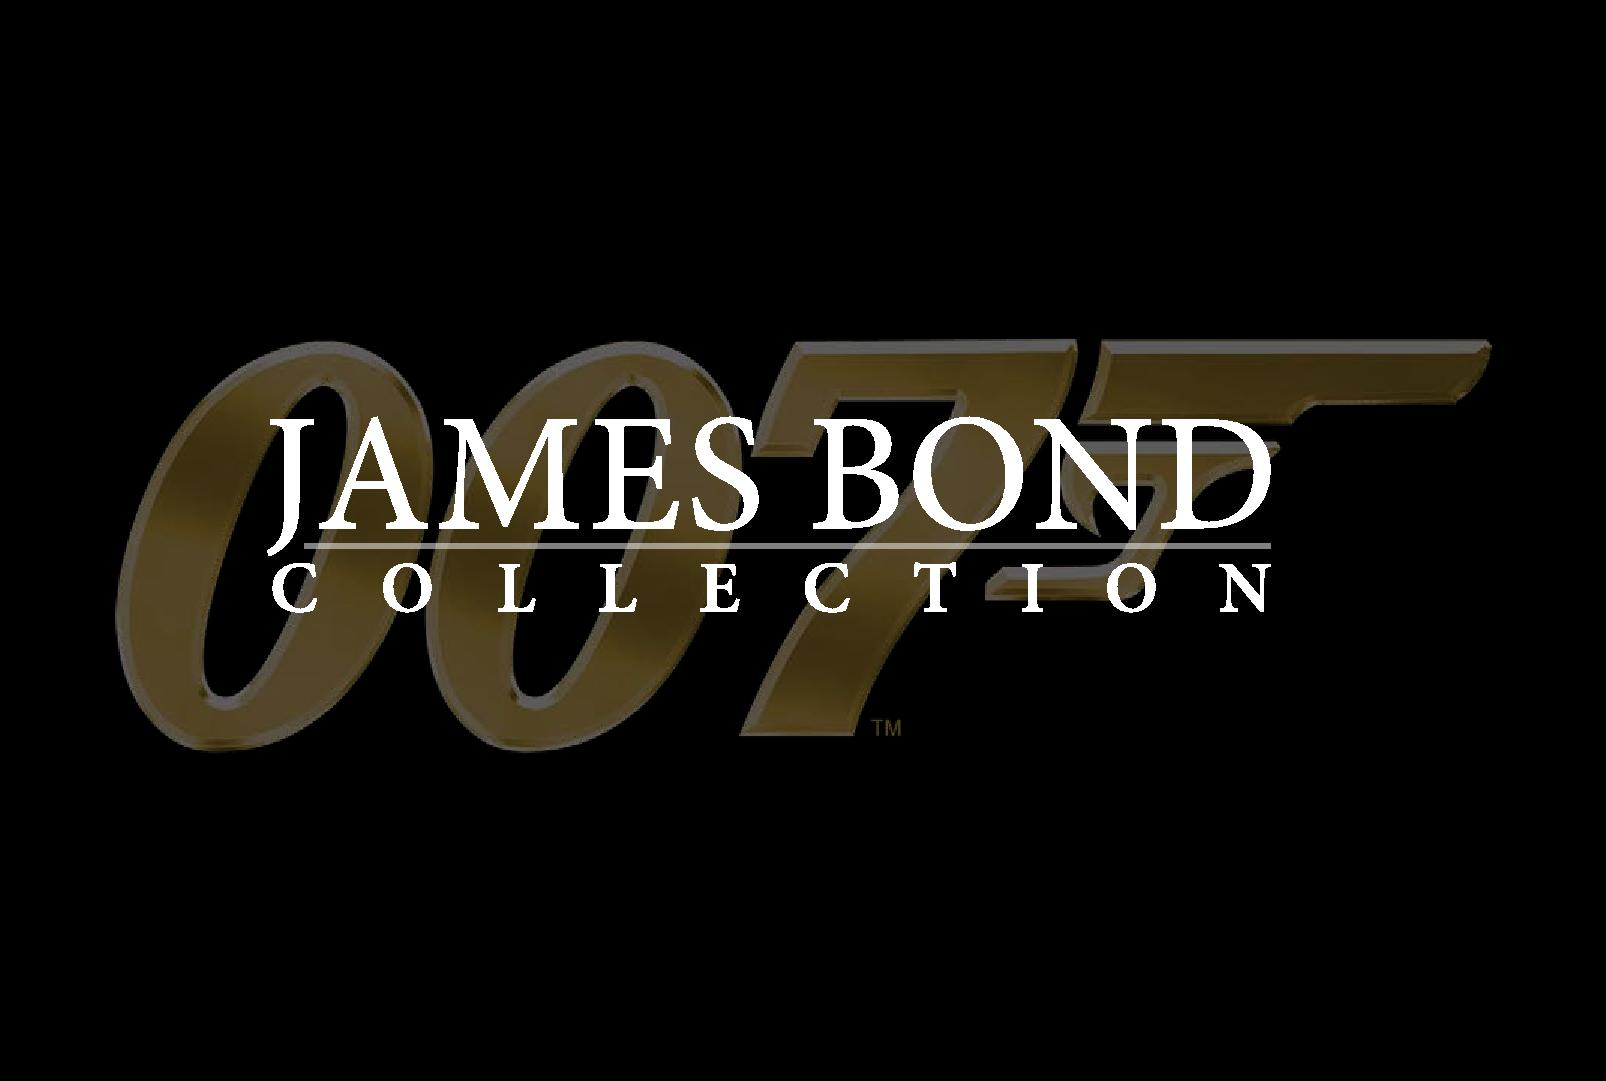 007_JamesBond_Gazzetta